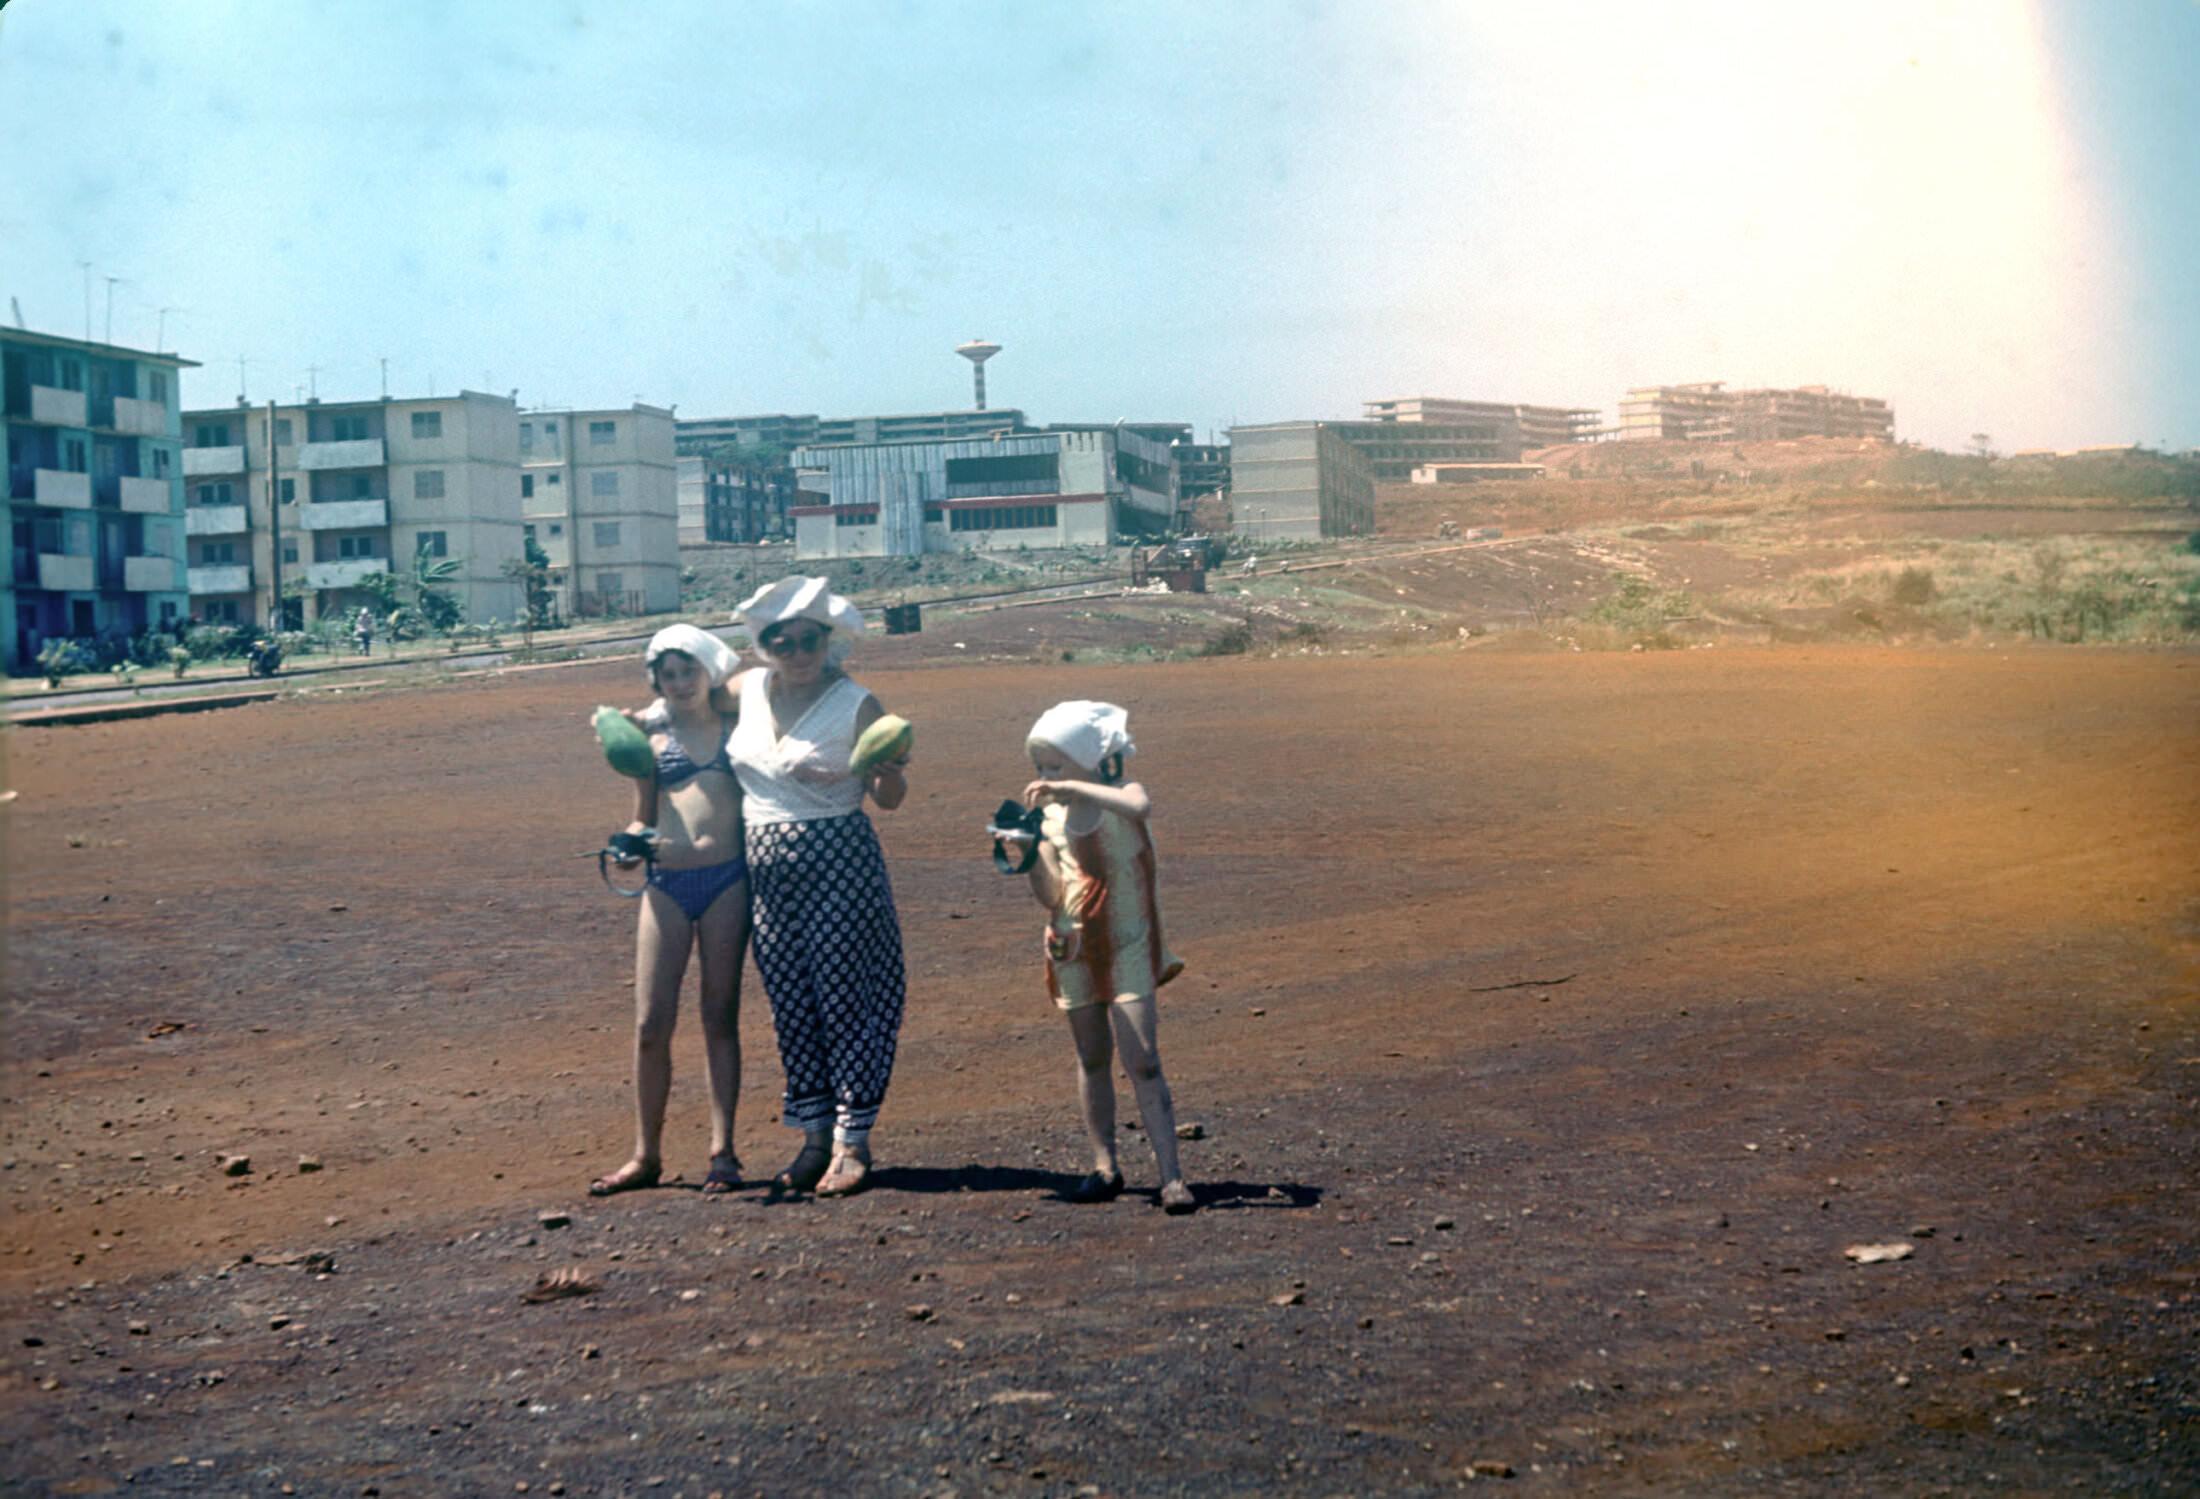 1980-1983. Фото 04. На дальнем плане интерклуб. На снимке Костикова Нина Яковлевна, а также Костиковы Лариса и Алла.